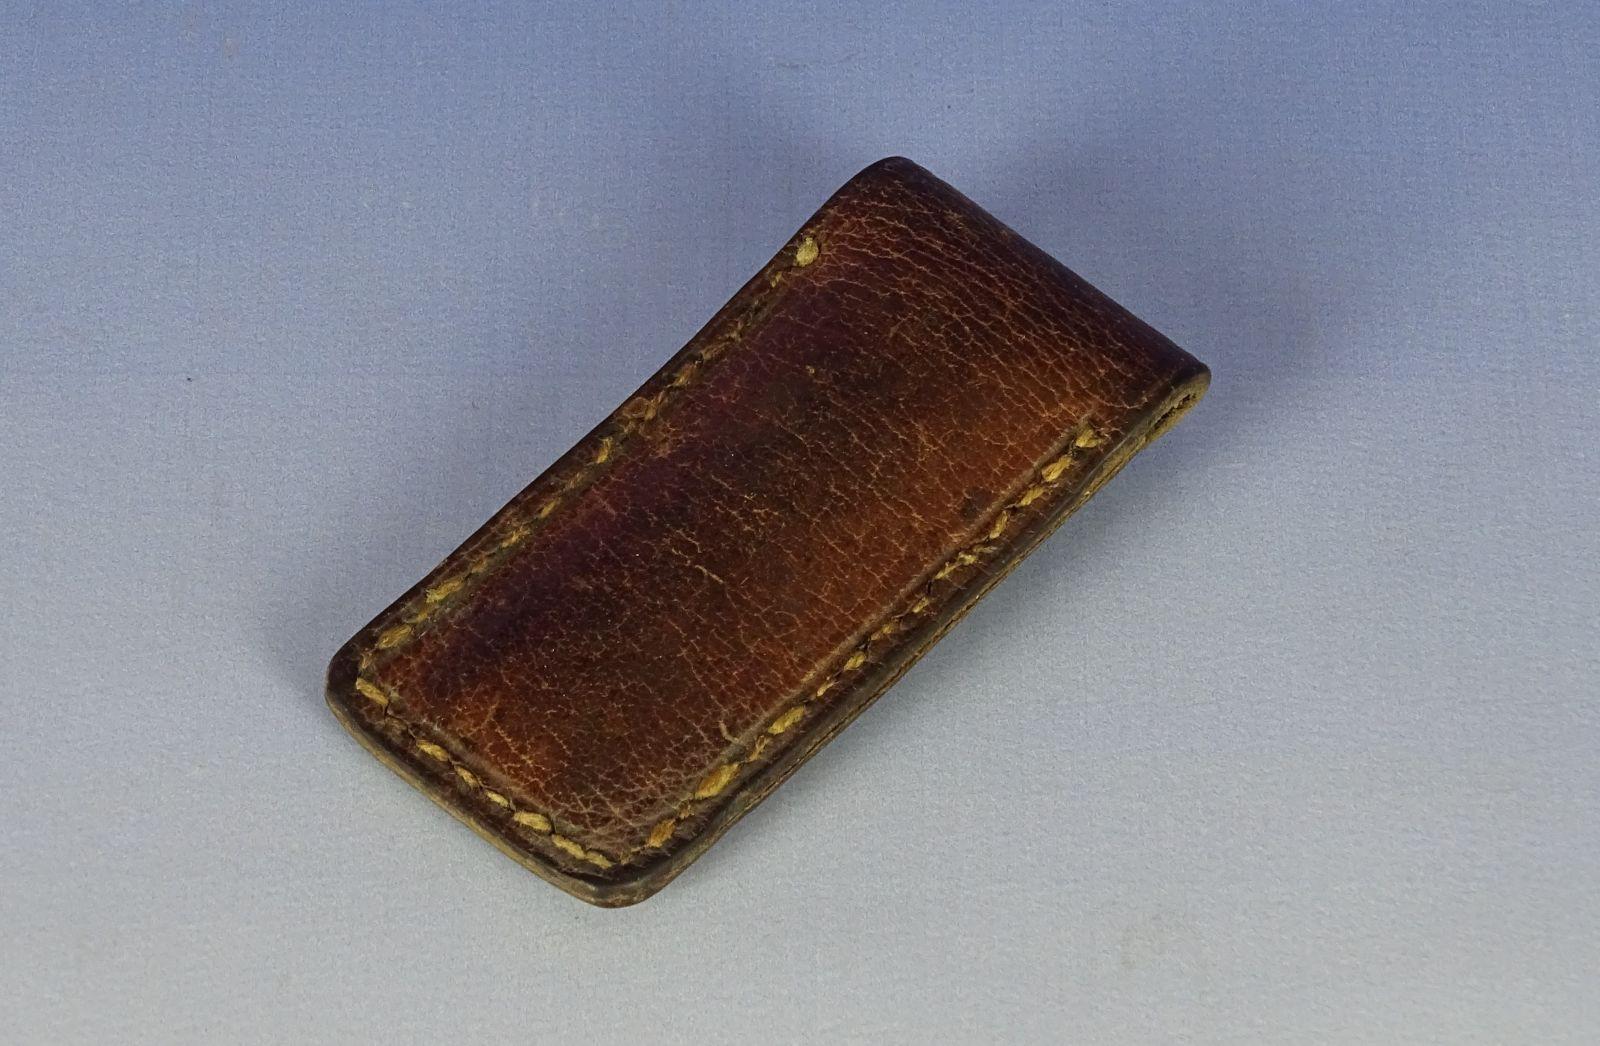 DSC02029.JPG (1600�1046)